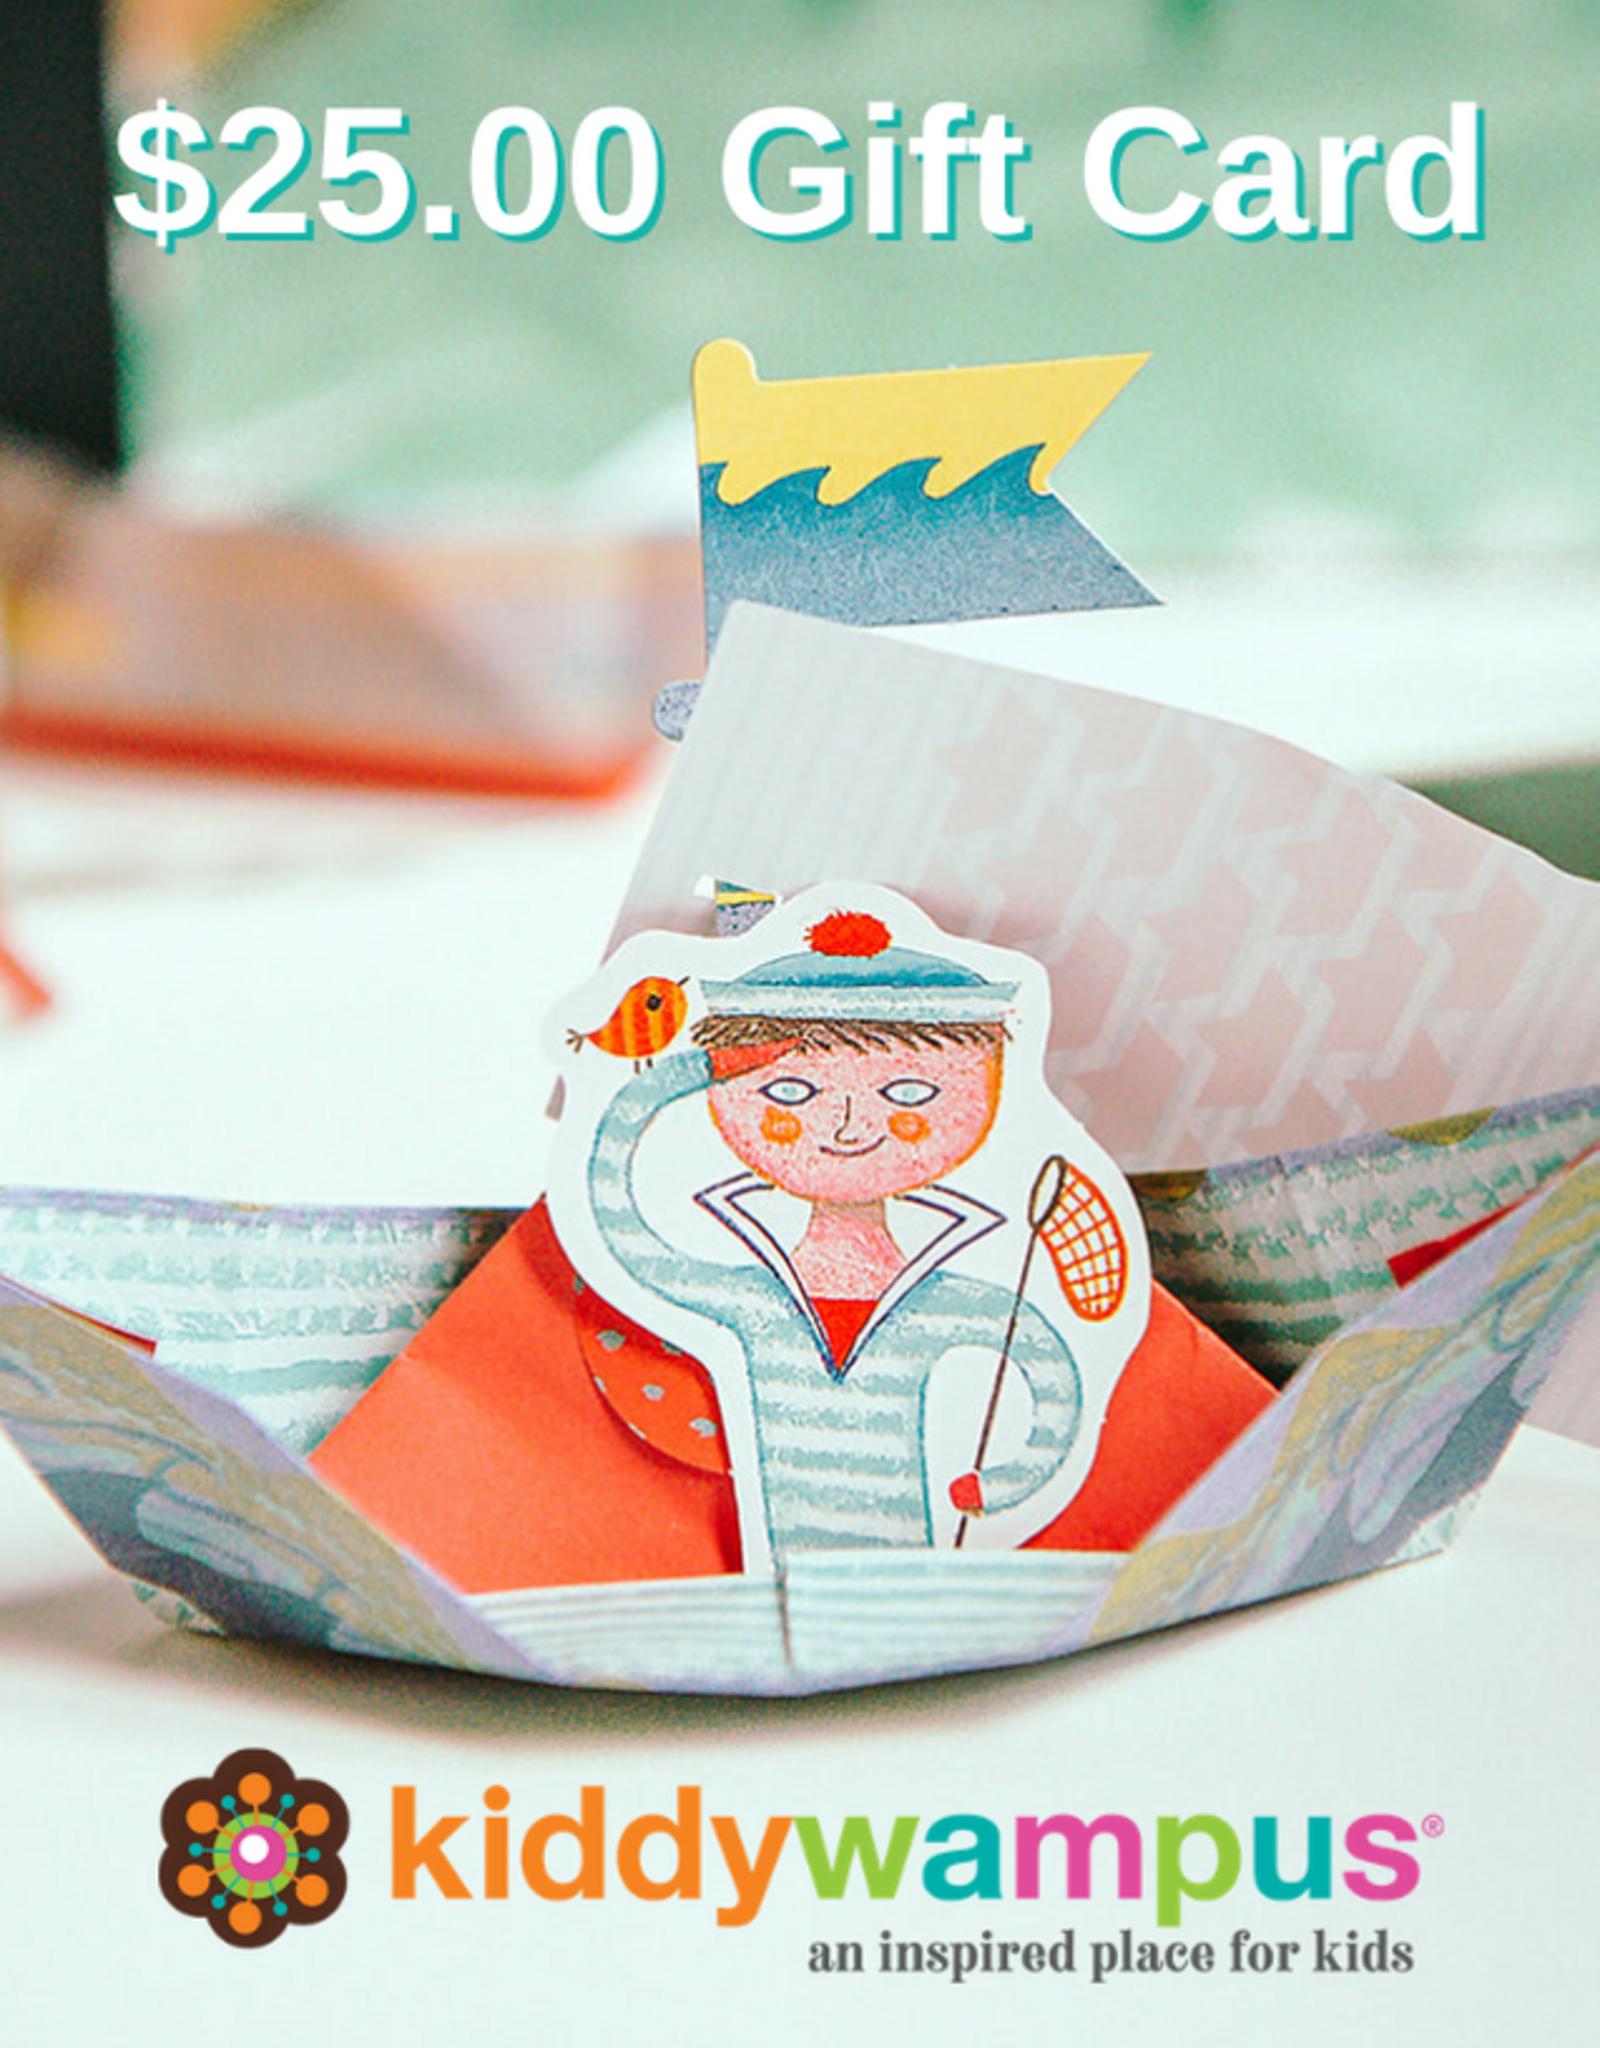 kiddywampus Gift Card $25